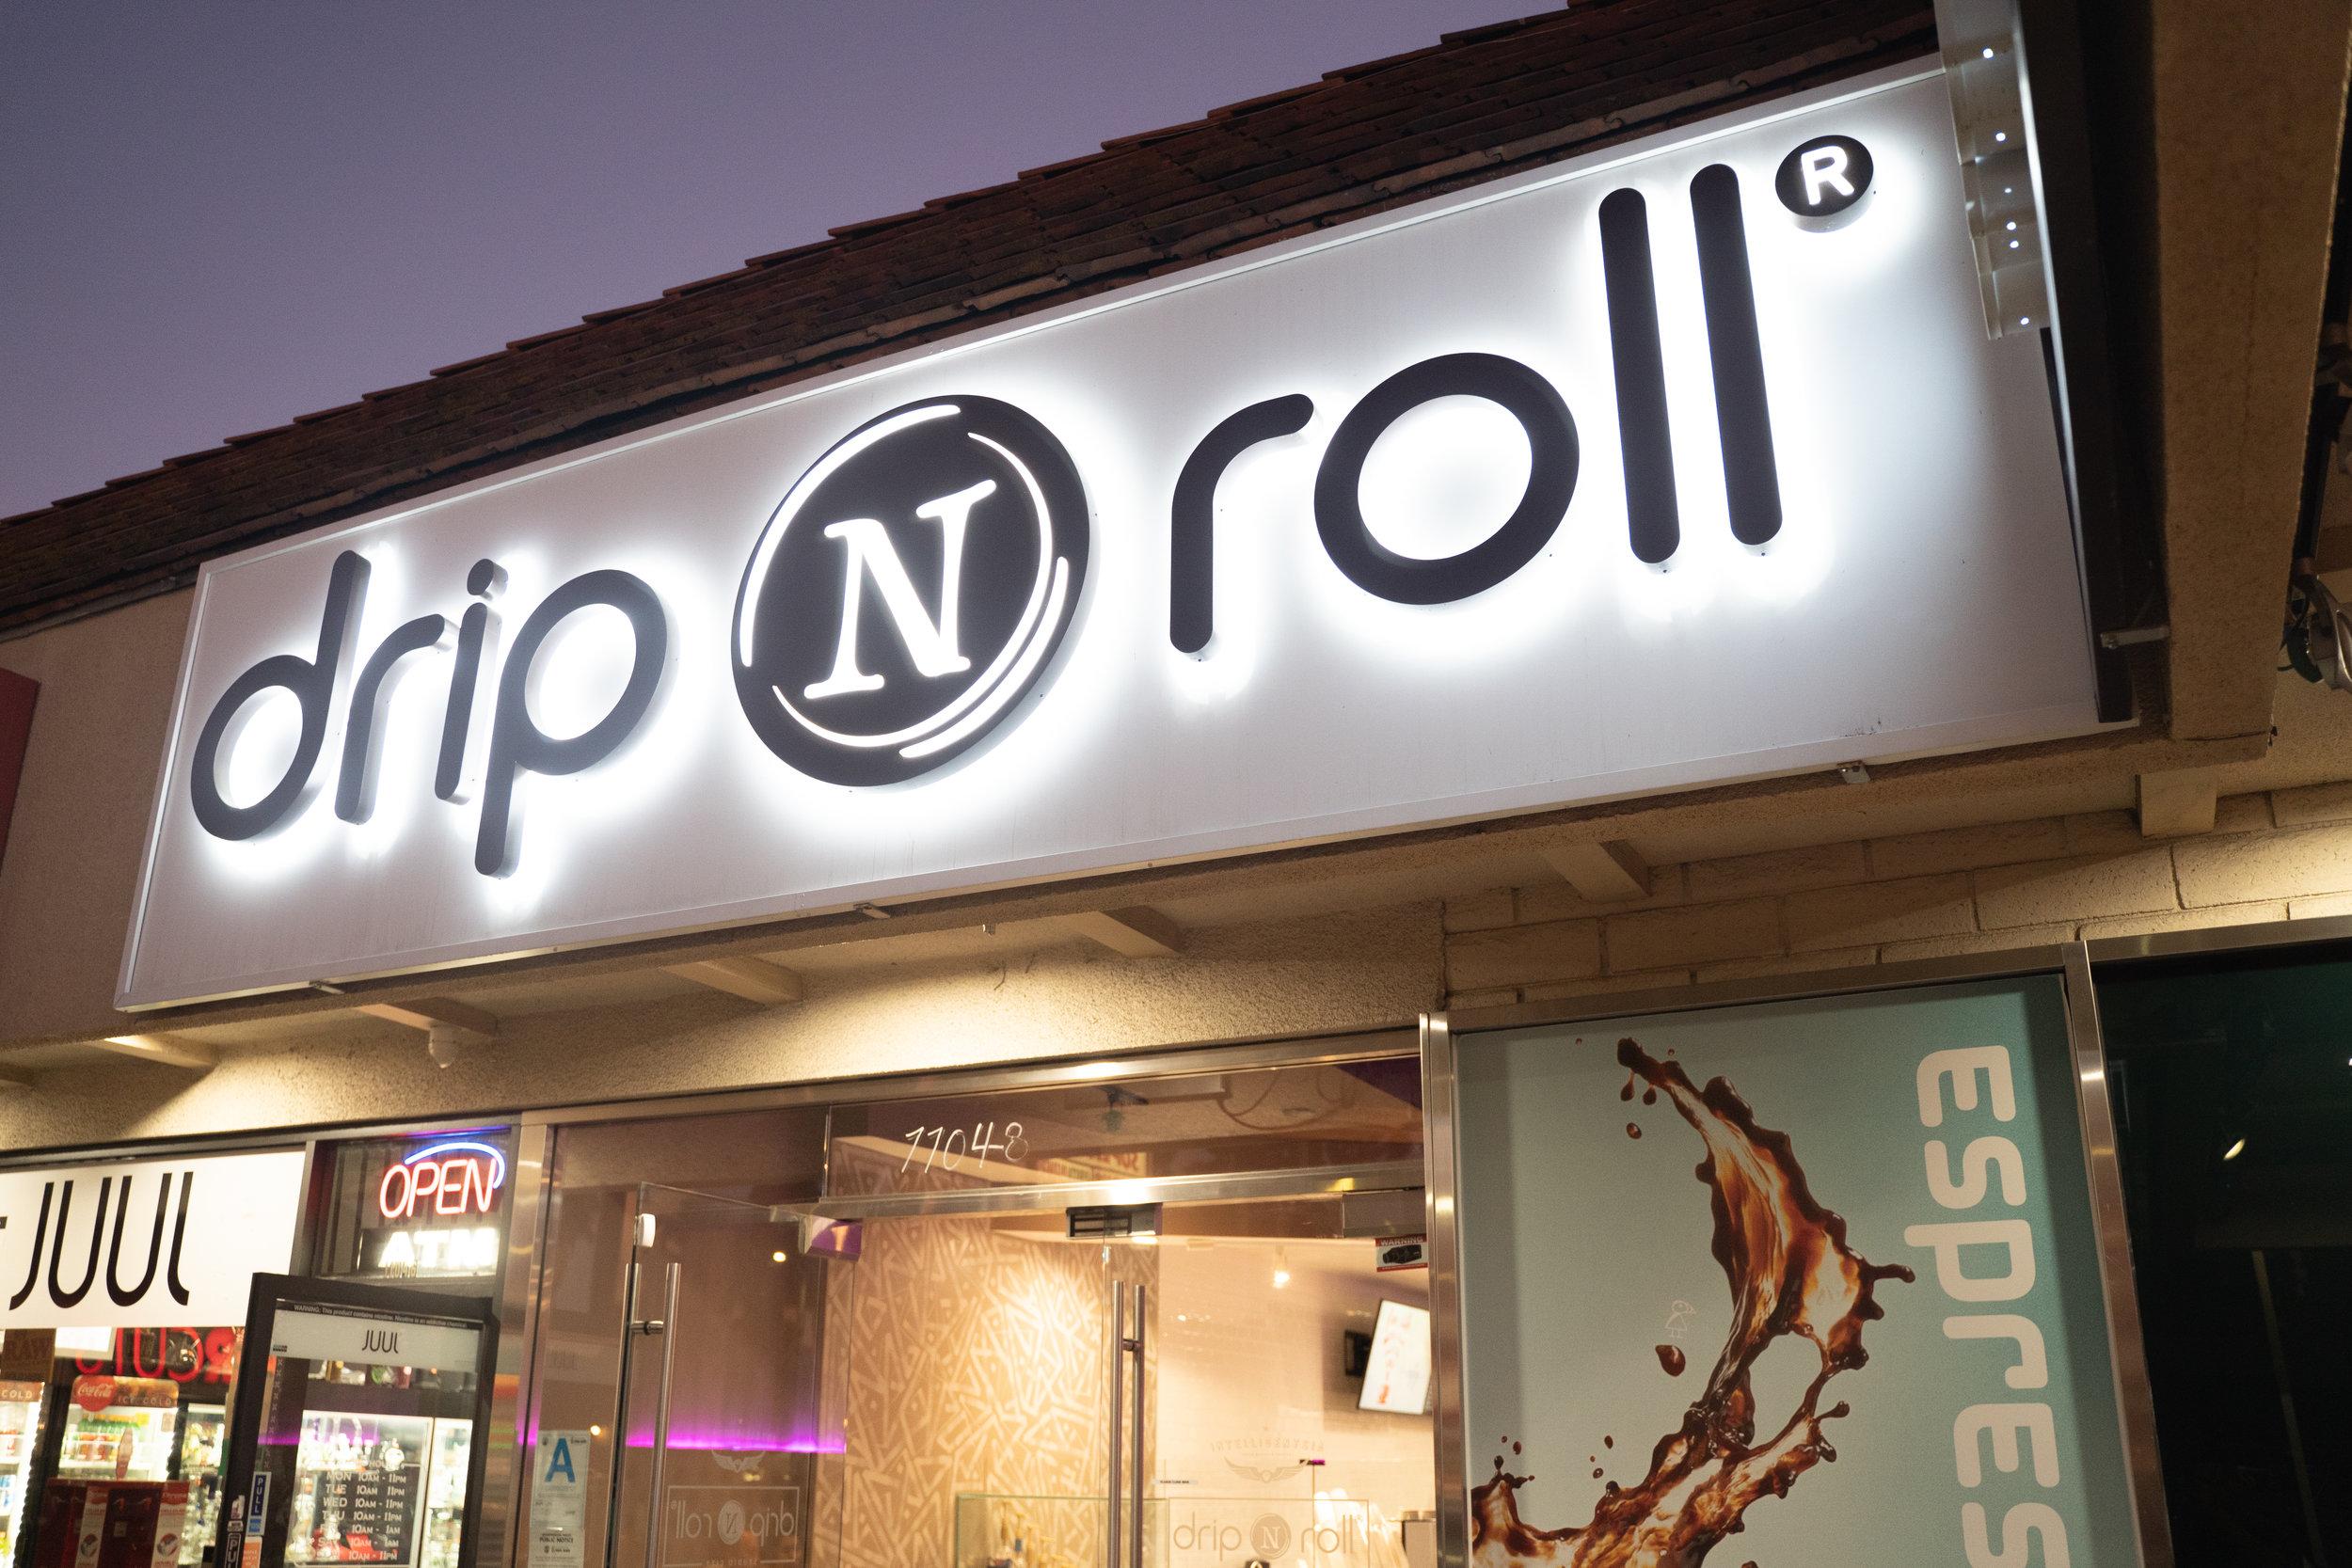 Exterior of Drip N Roll in Studio City